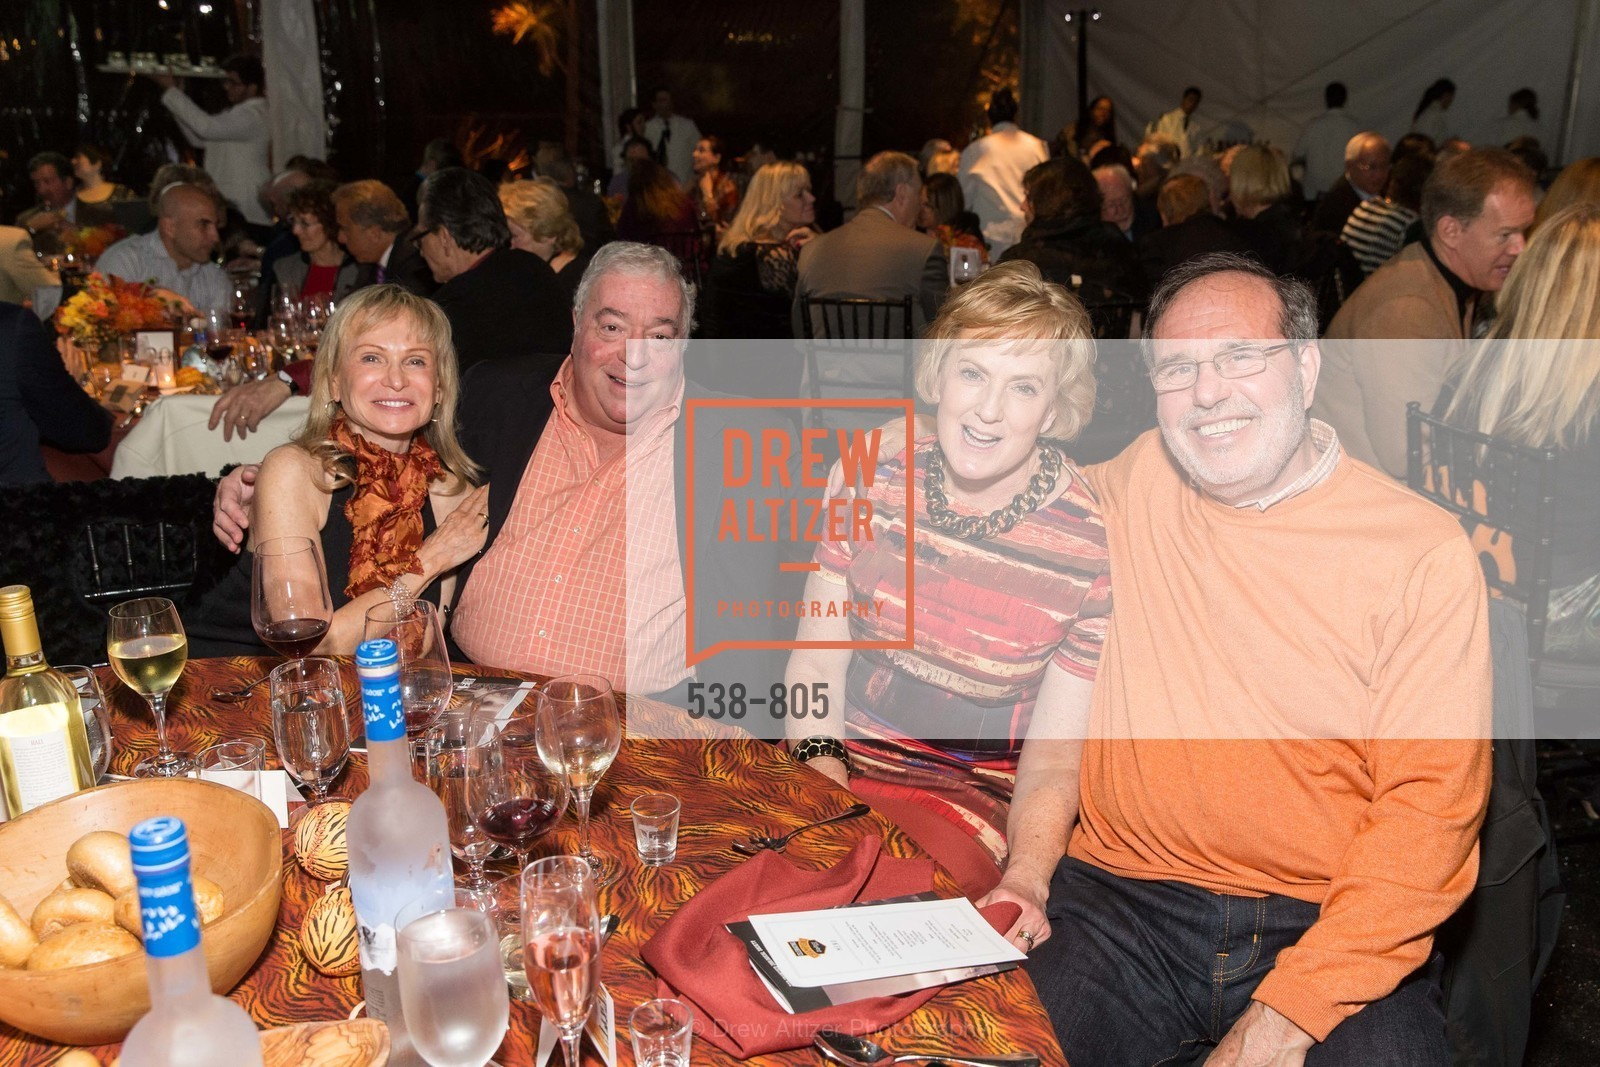 Marie Lipman, Barry Lipman, ZOOFEST 2015, US, April 25th, 2015,Drew Altizer, Drew Altizer Photography, full-service agency, private events, San Francisco photographer, photographer california